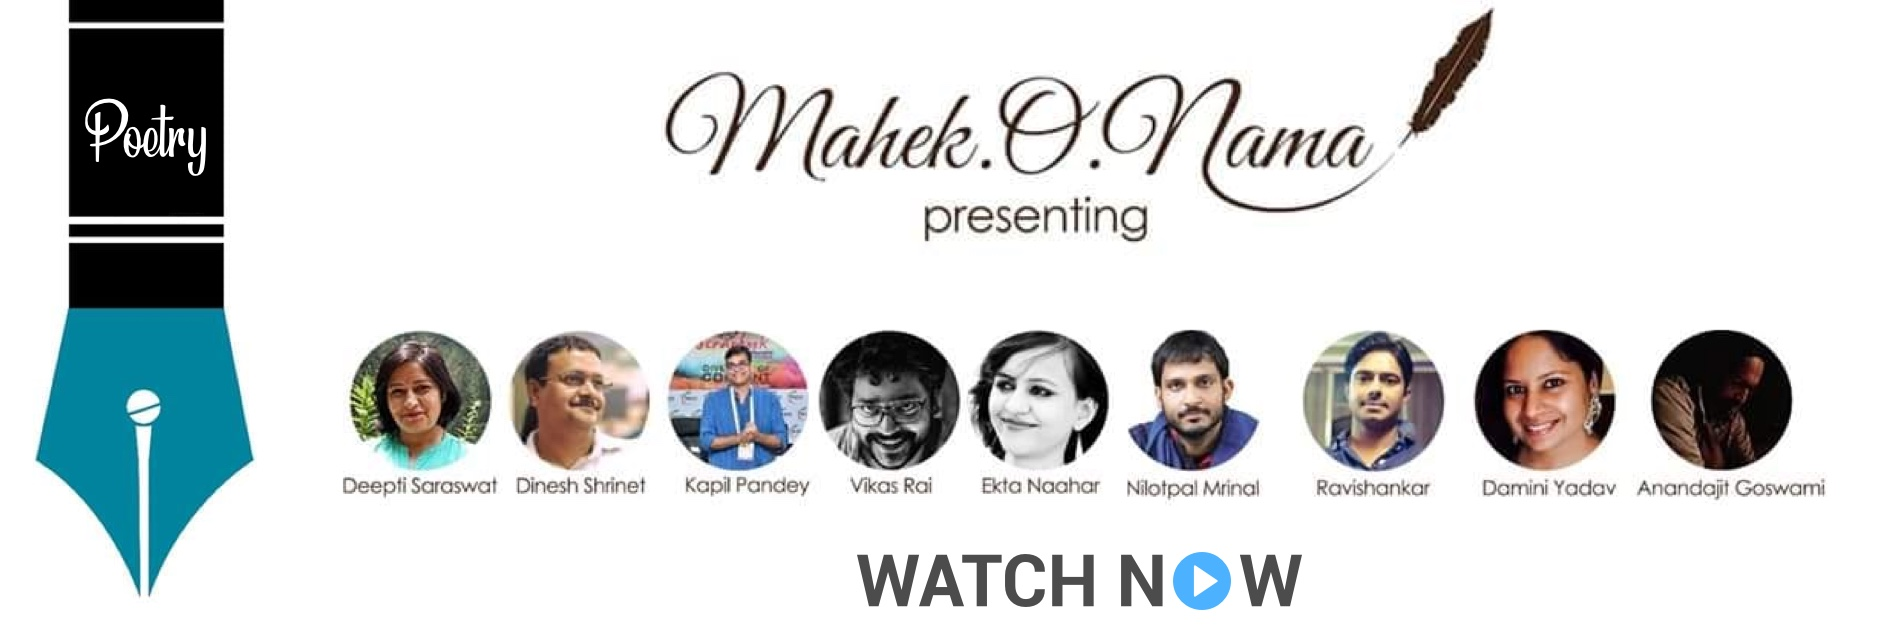 Mahek-O-Nama videos on Matrubharti